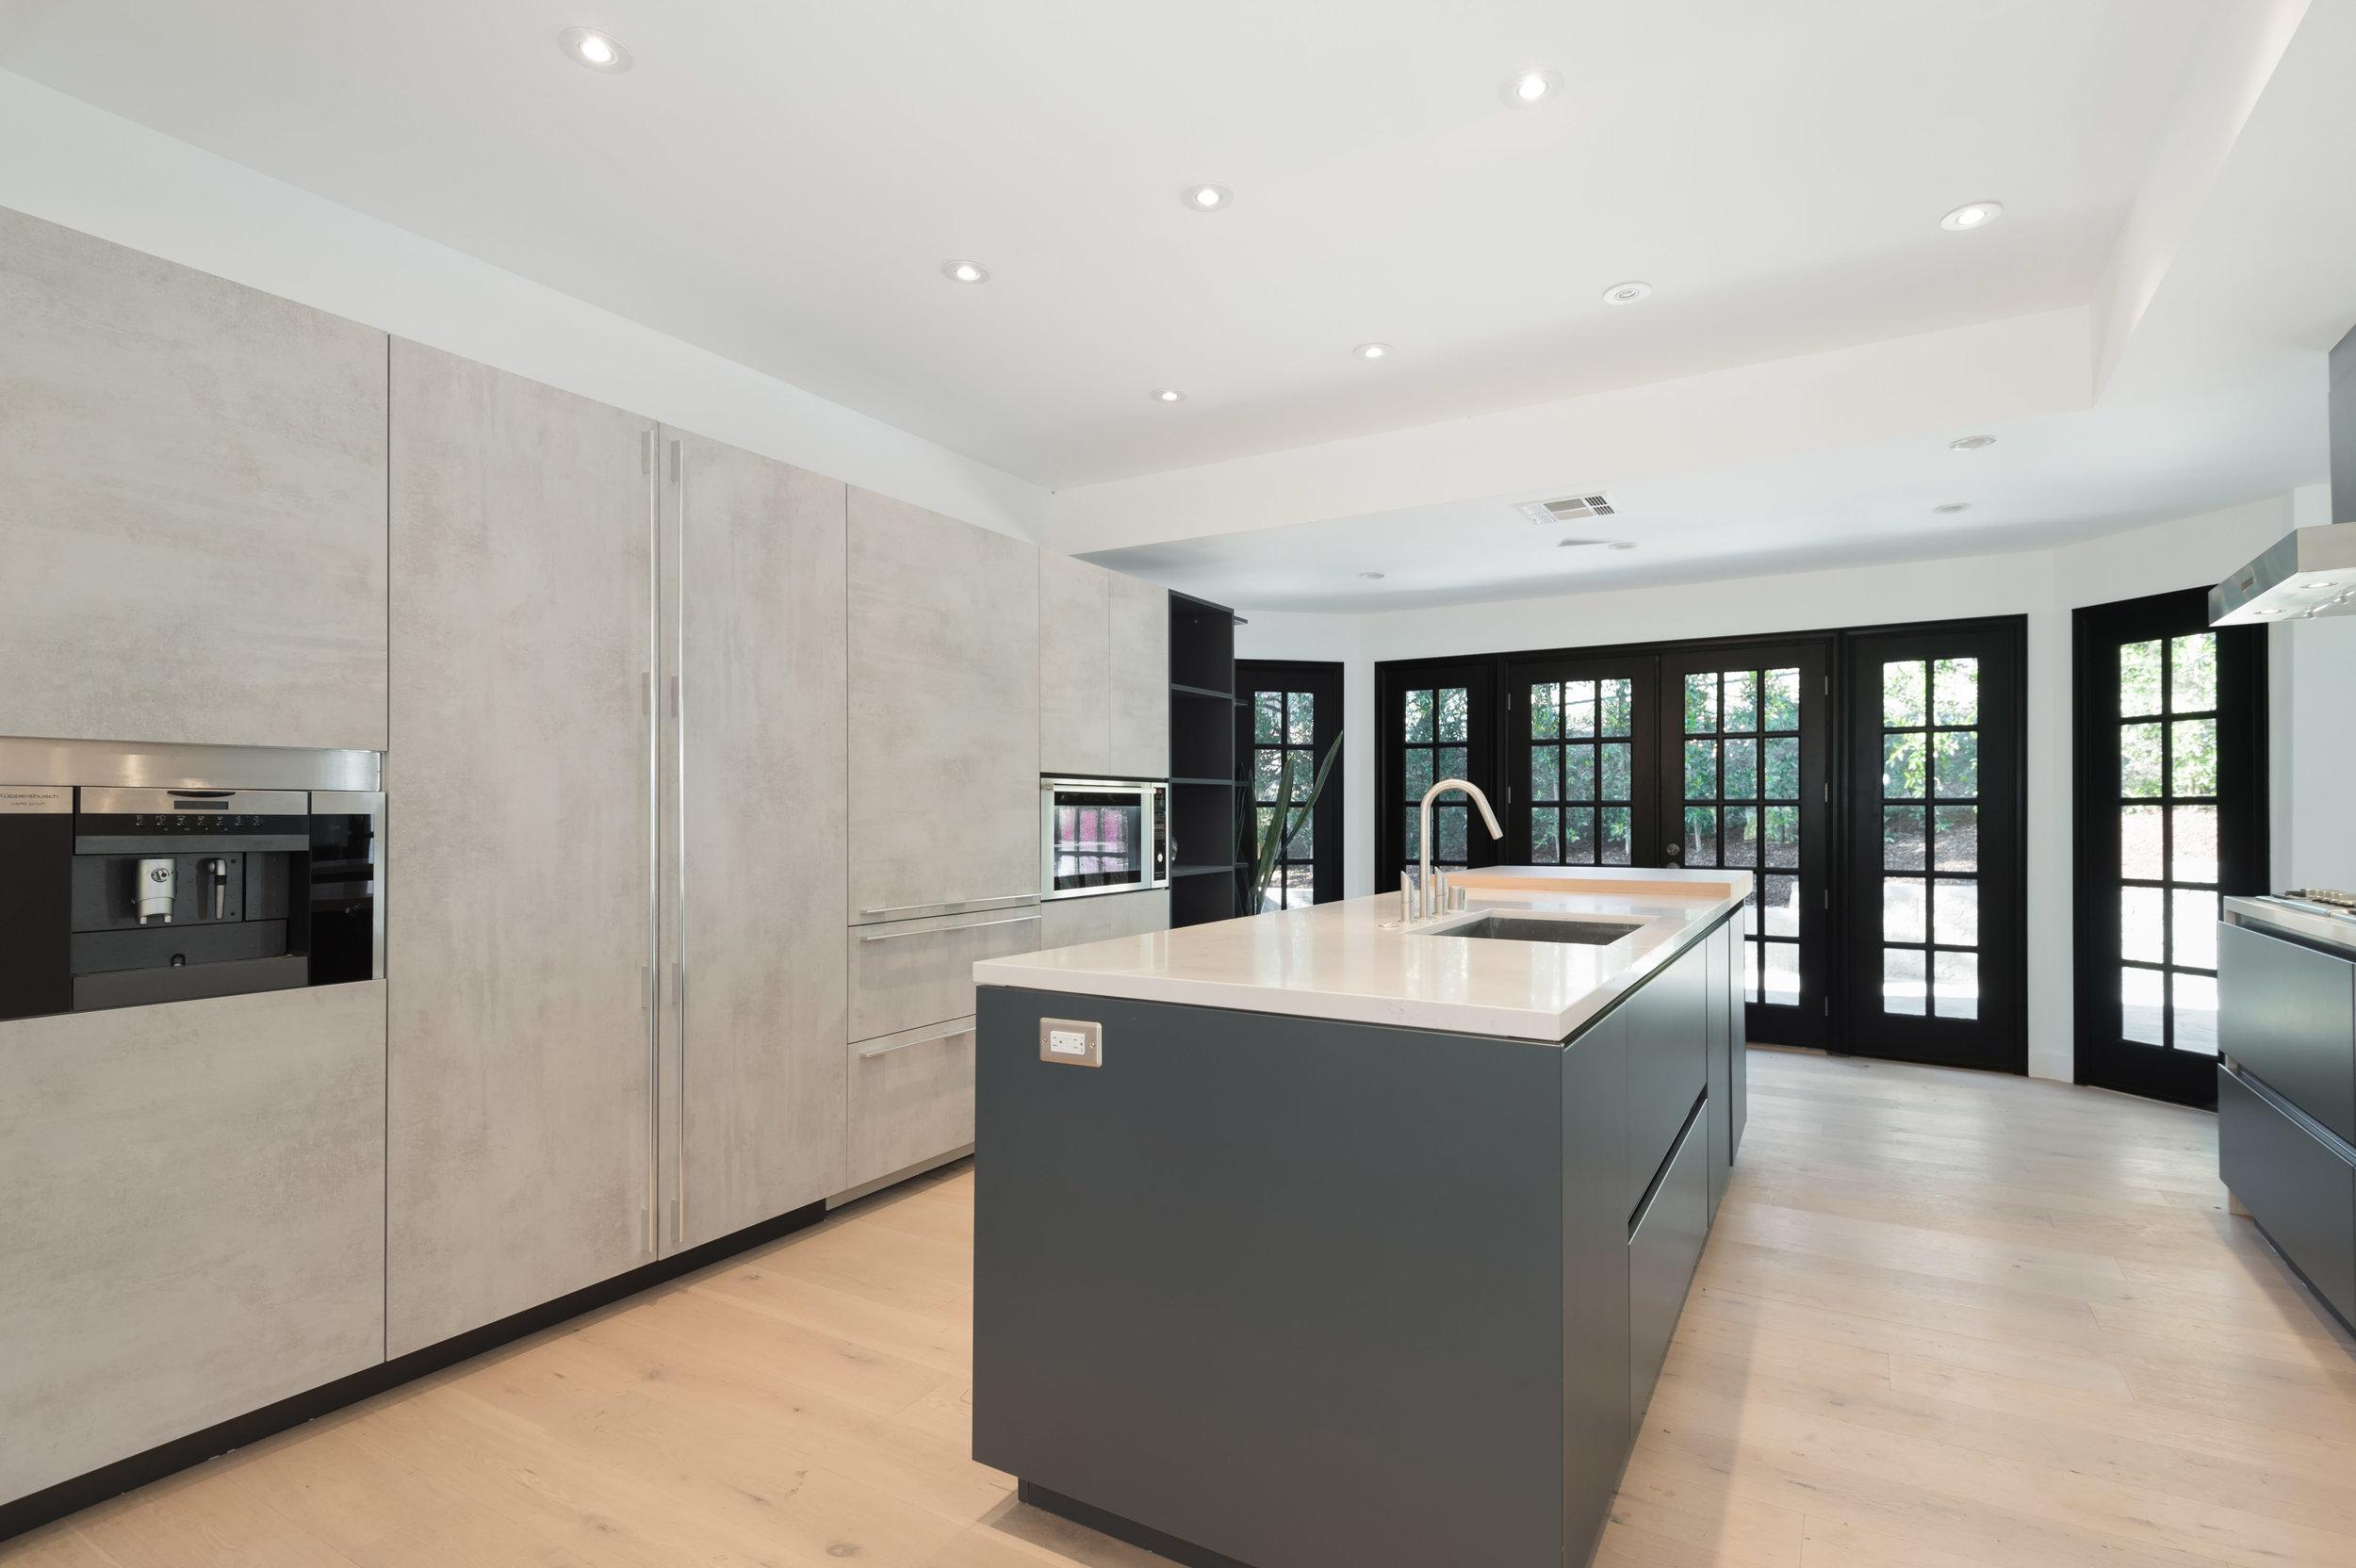 009 kitchen 30340 Morning View Malibu For Sale The Malibu Life Team Luxury Real Estate.jpg